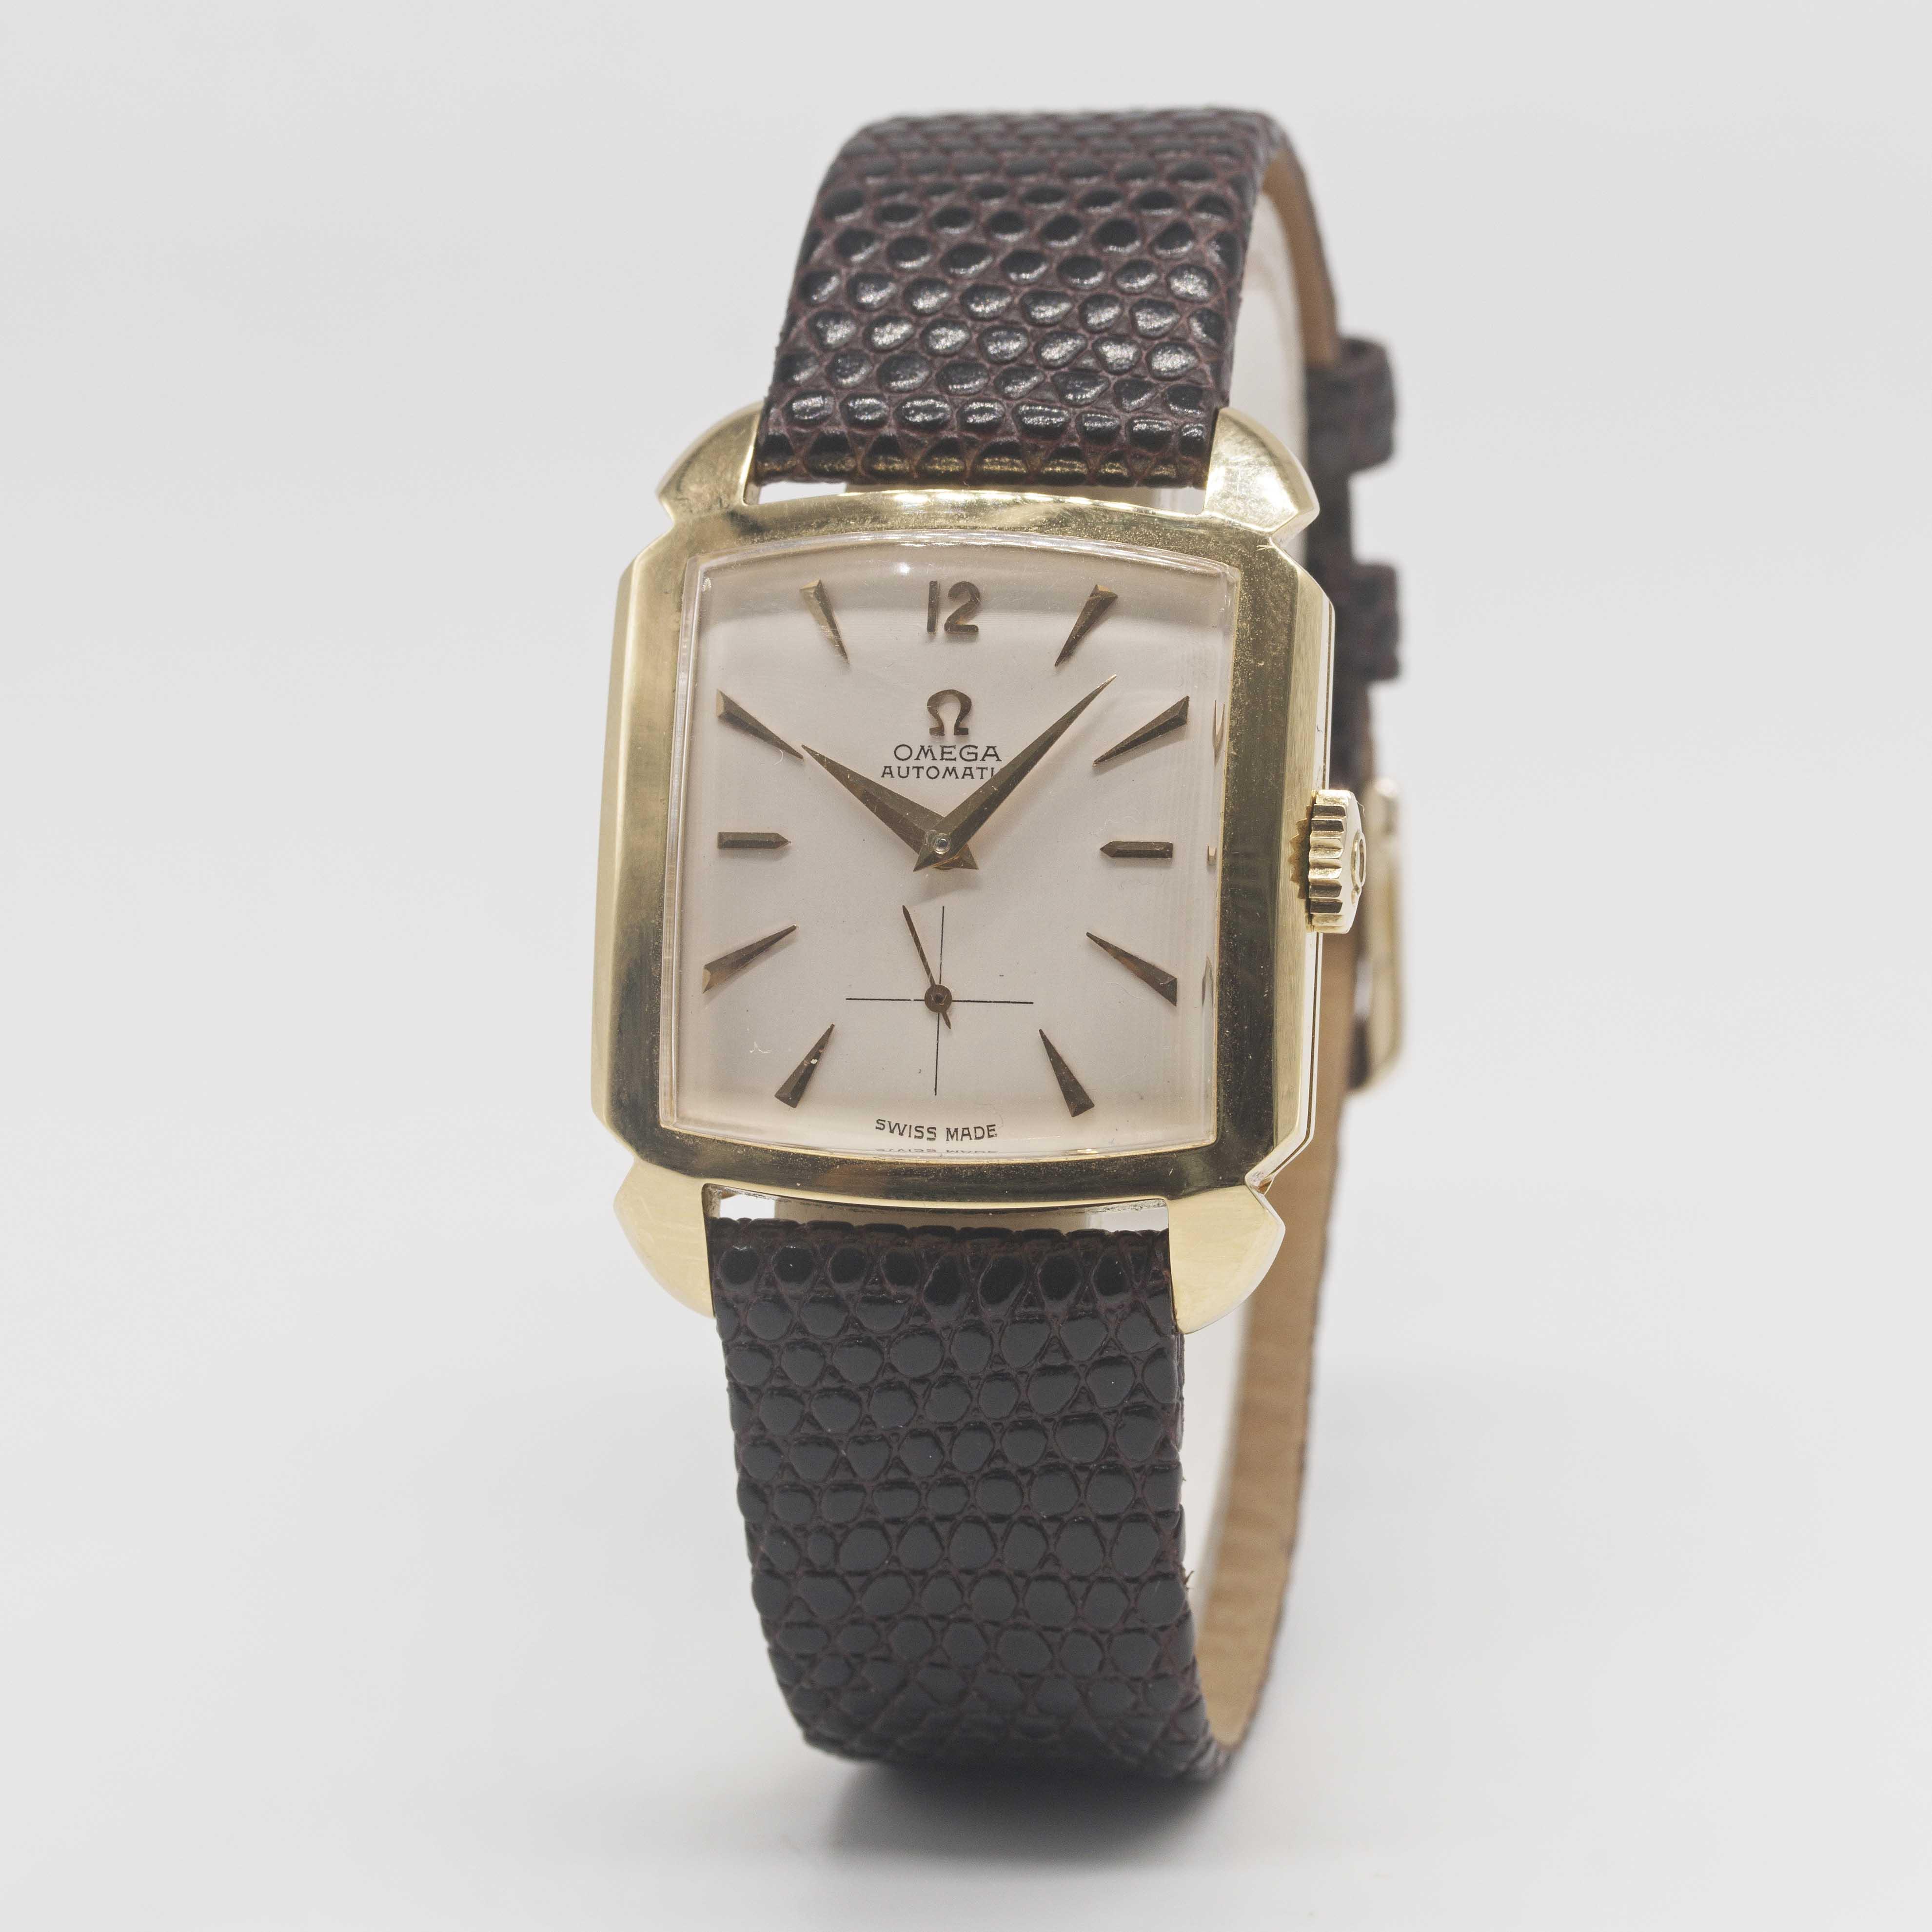 "Lot 18 - A GENTLEMAN'S 18K SOLID GOLD OMEGA AUTOMATIC ""CIOCCOLATONE"" WRIST WATCH CIRCA 1952, REF. 3950"